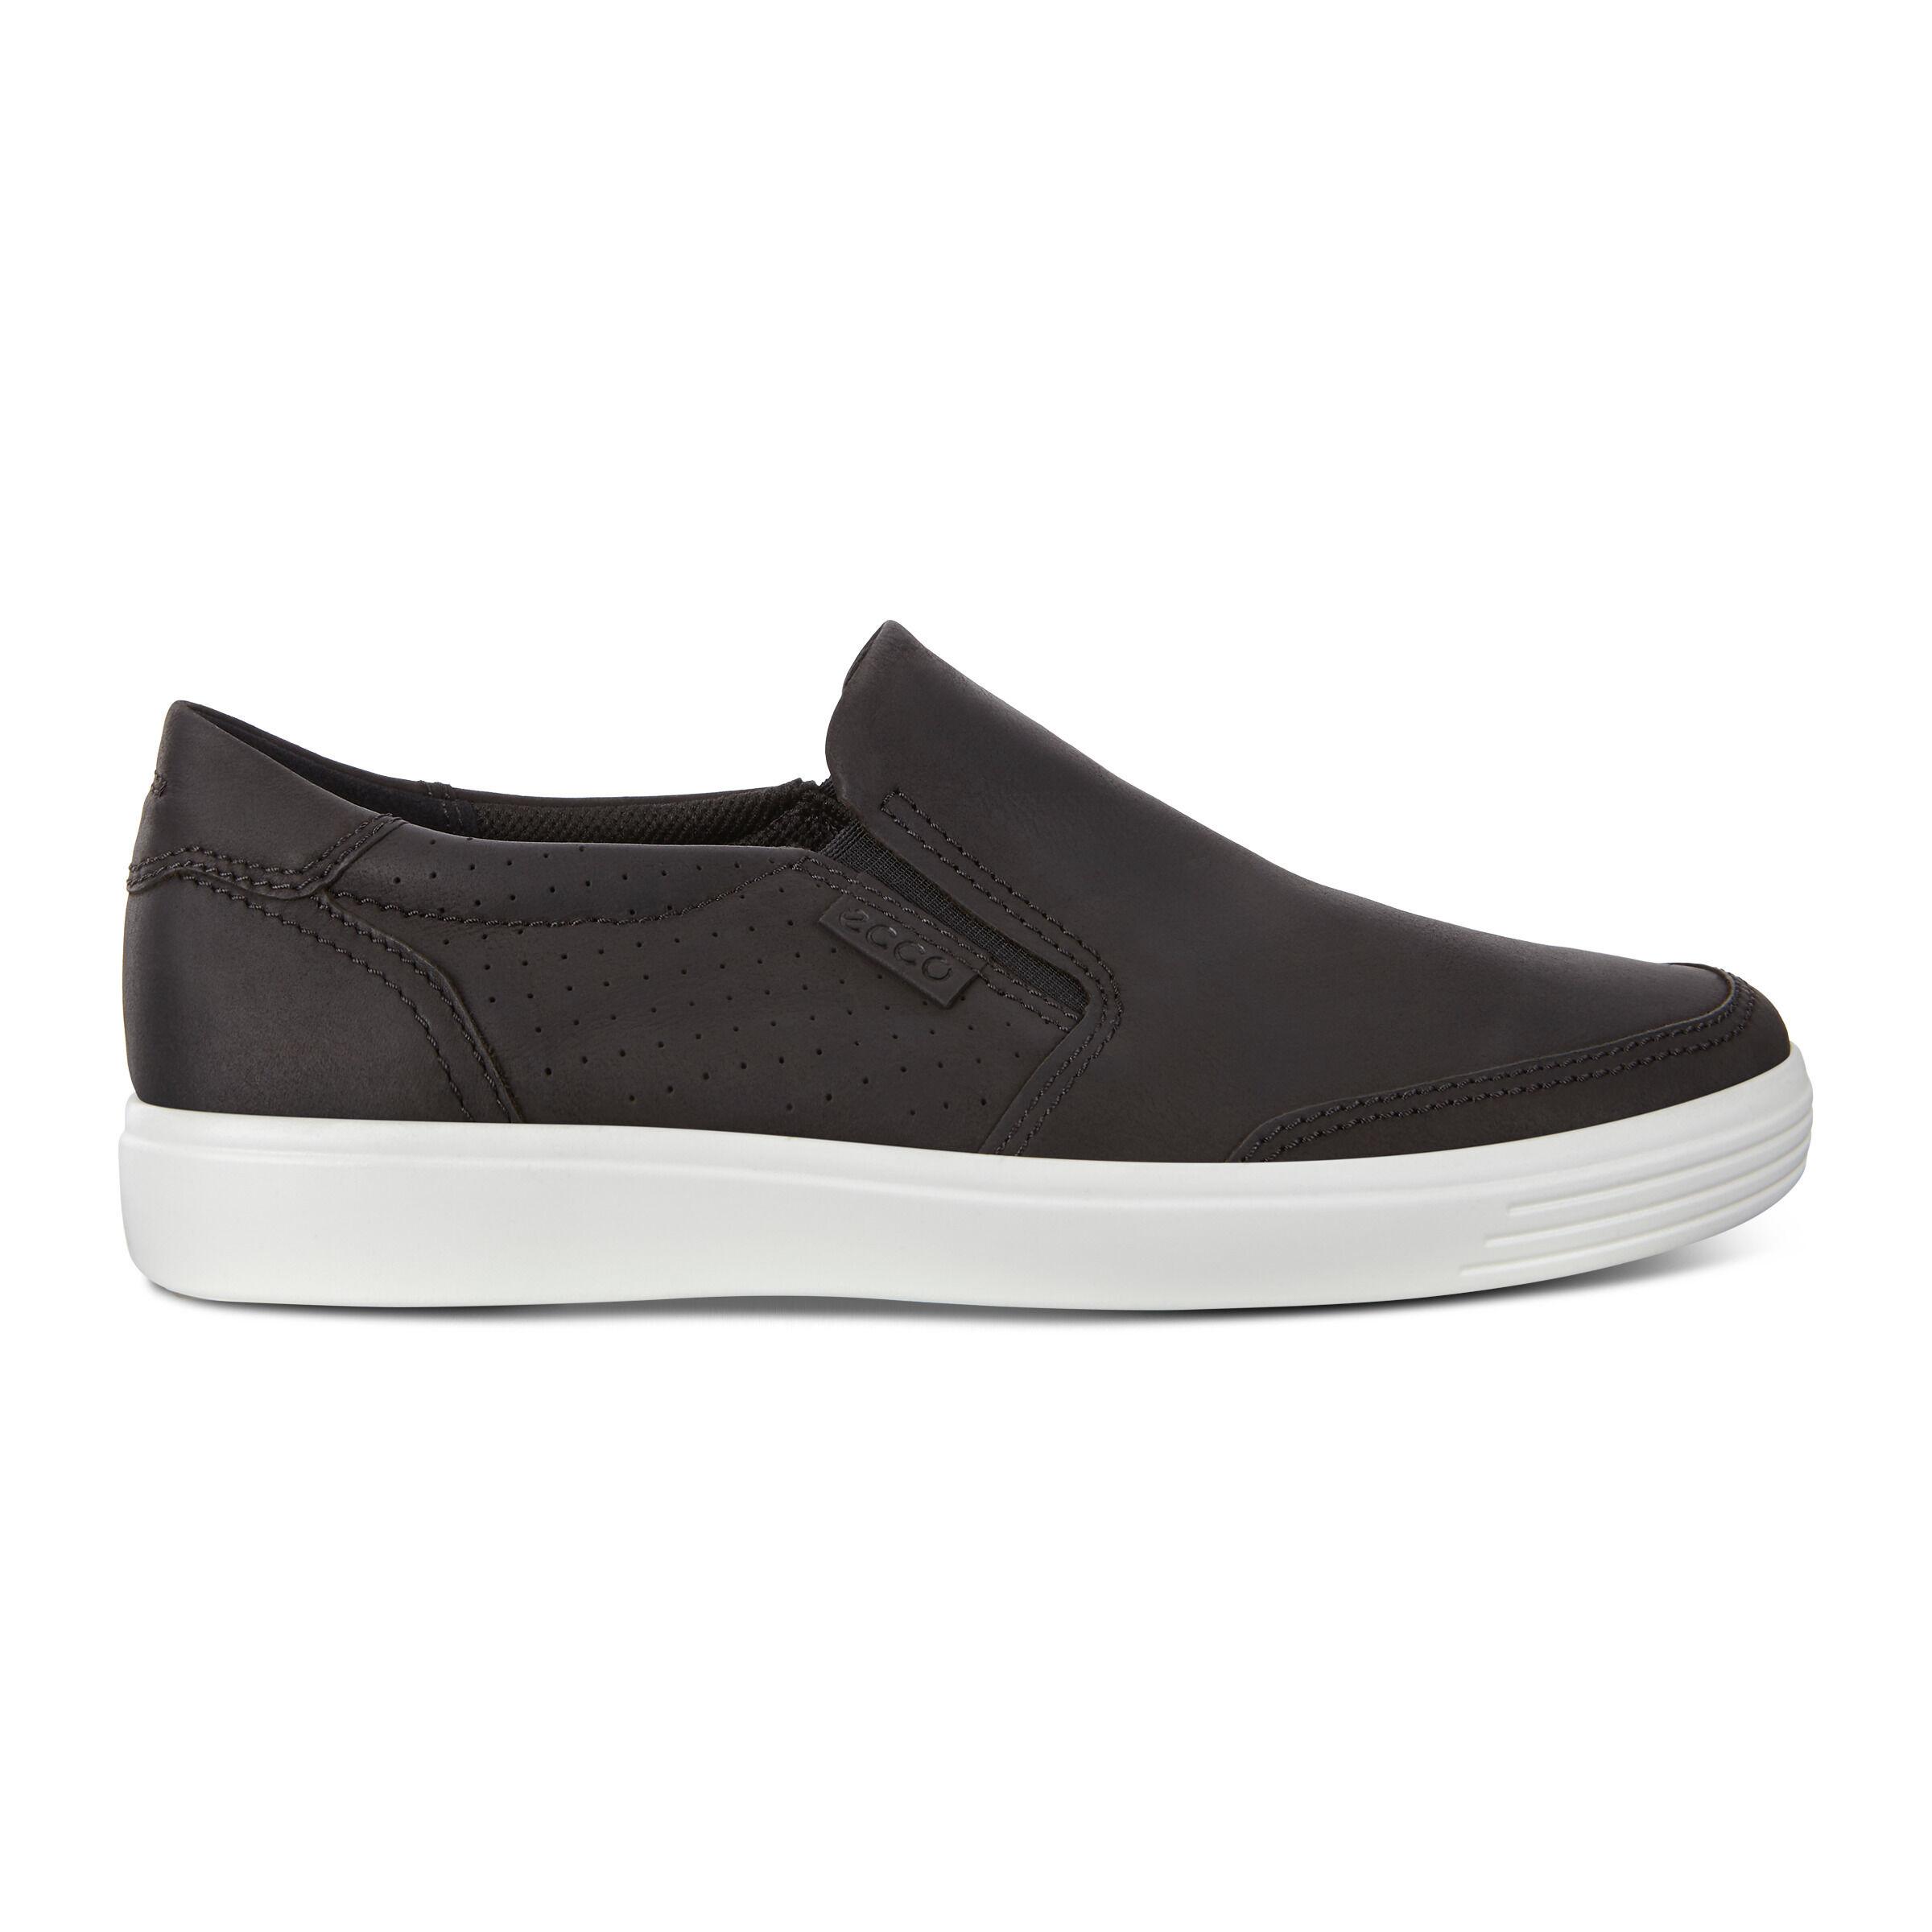 ECCO Soft 7 Mens Slip On Sneaker